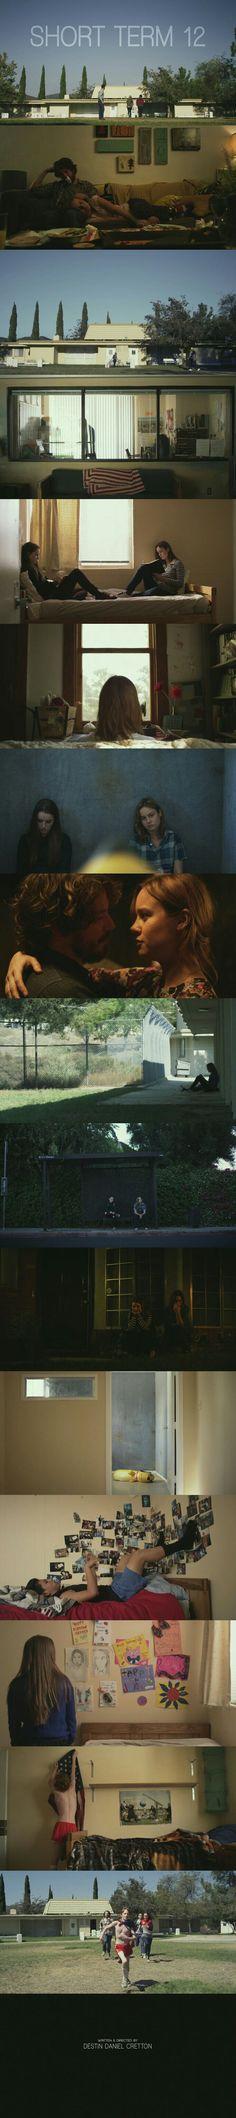 Short Term 12 (2013) Directed by Destin Daniel Cretton.